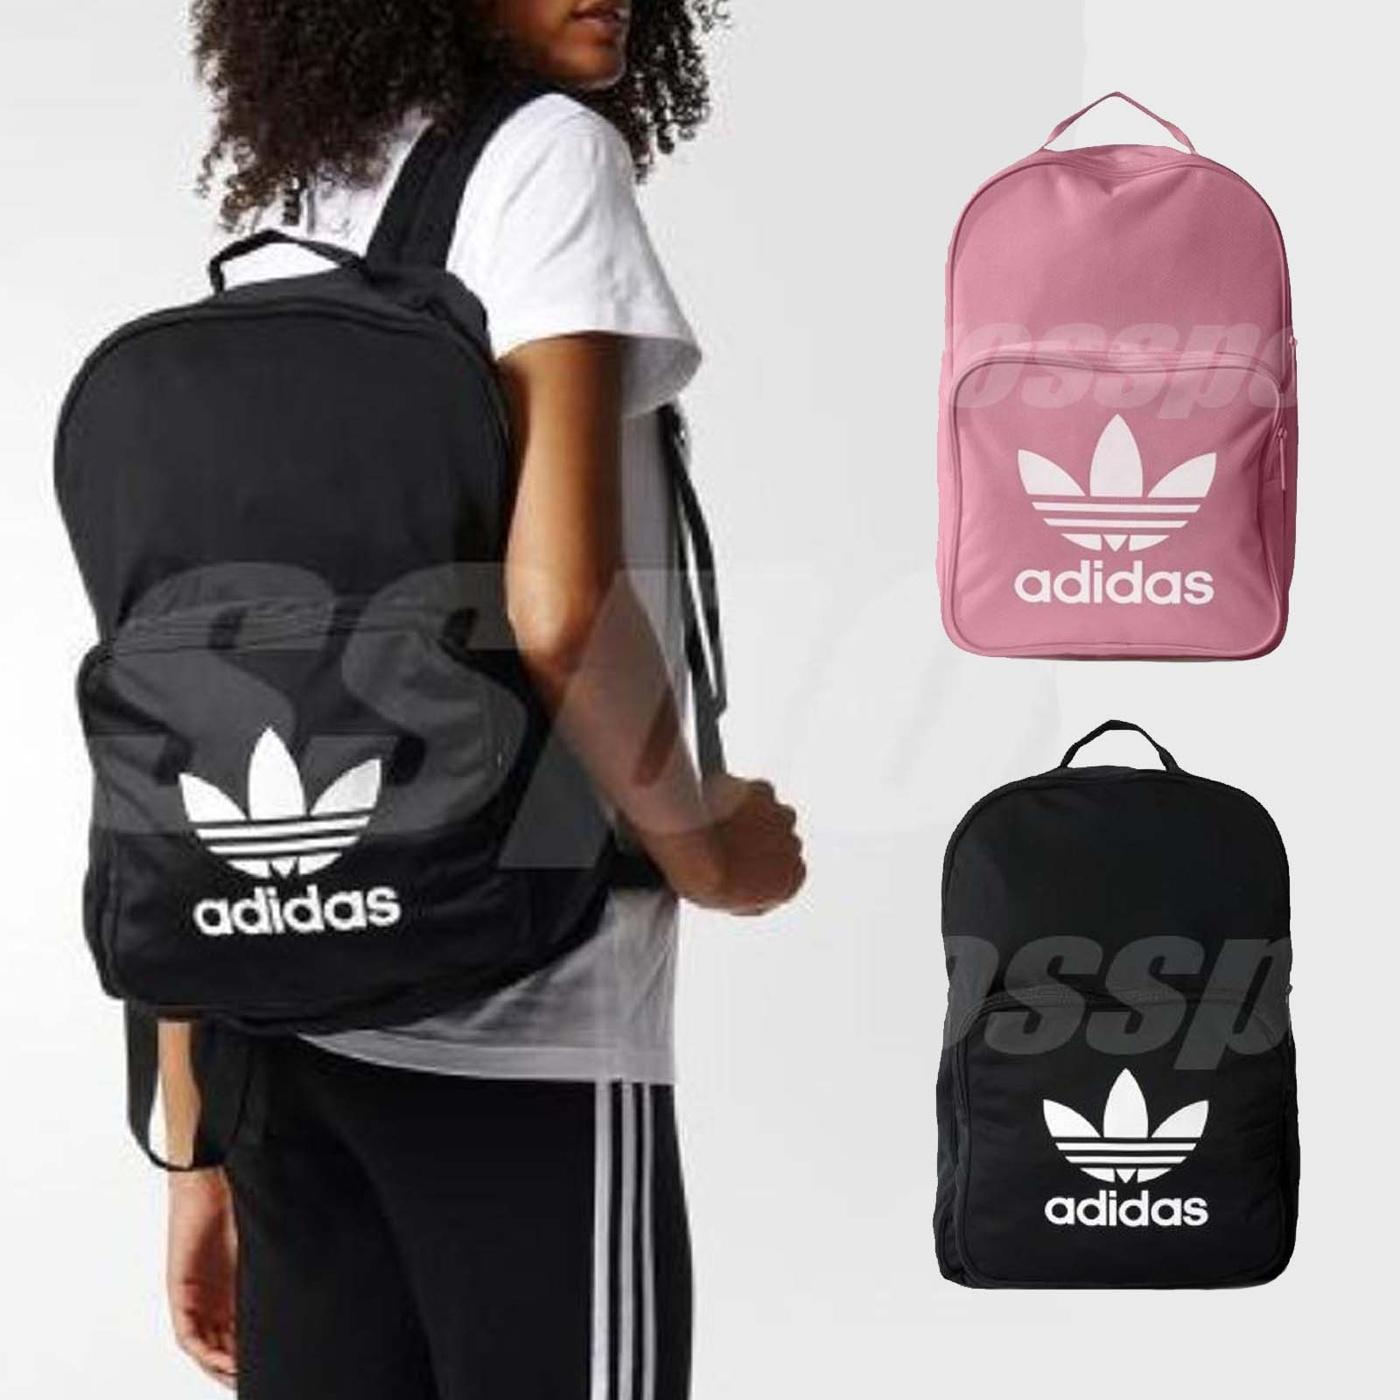 adidas後背包Tricot Classic Backpack三葉草Logo女款包包基本款粉紅黑白PUMP306